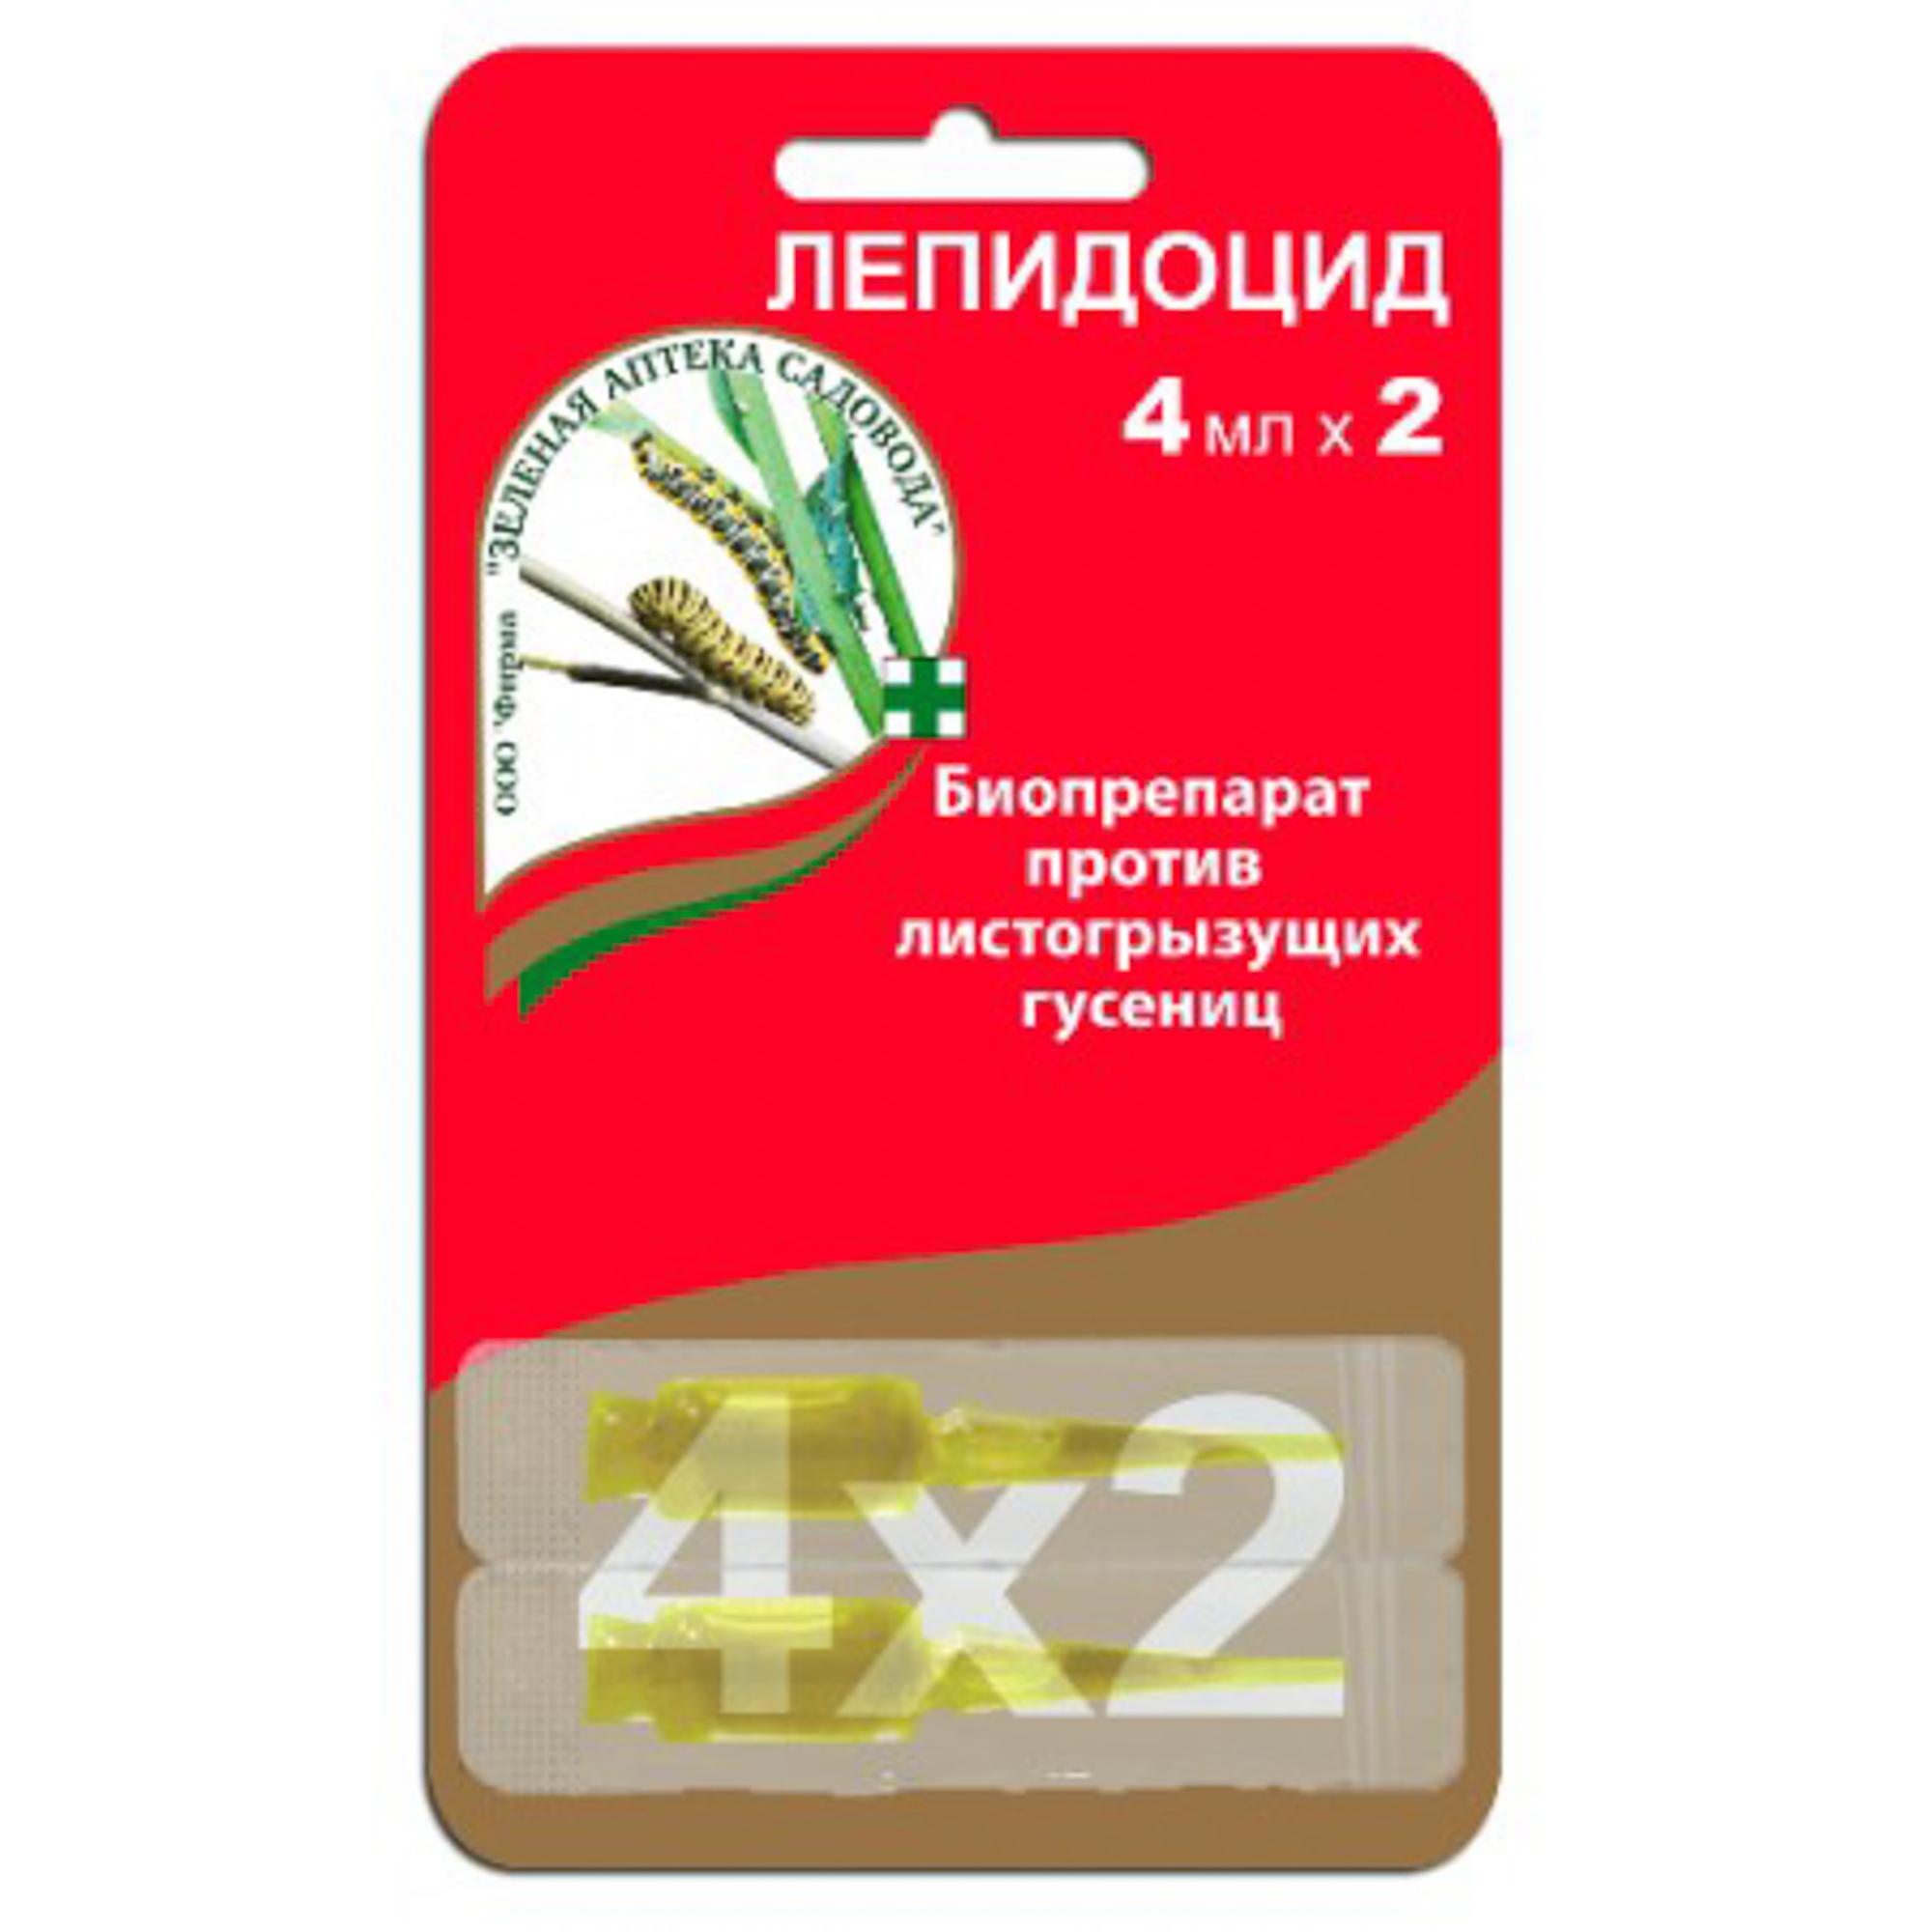 Препарат Лепидоцид Зеленая Аптека 2 х 4 мл